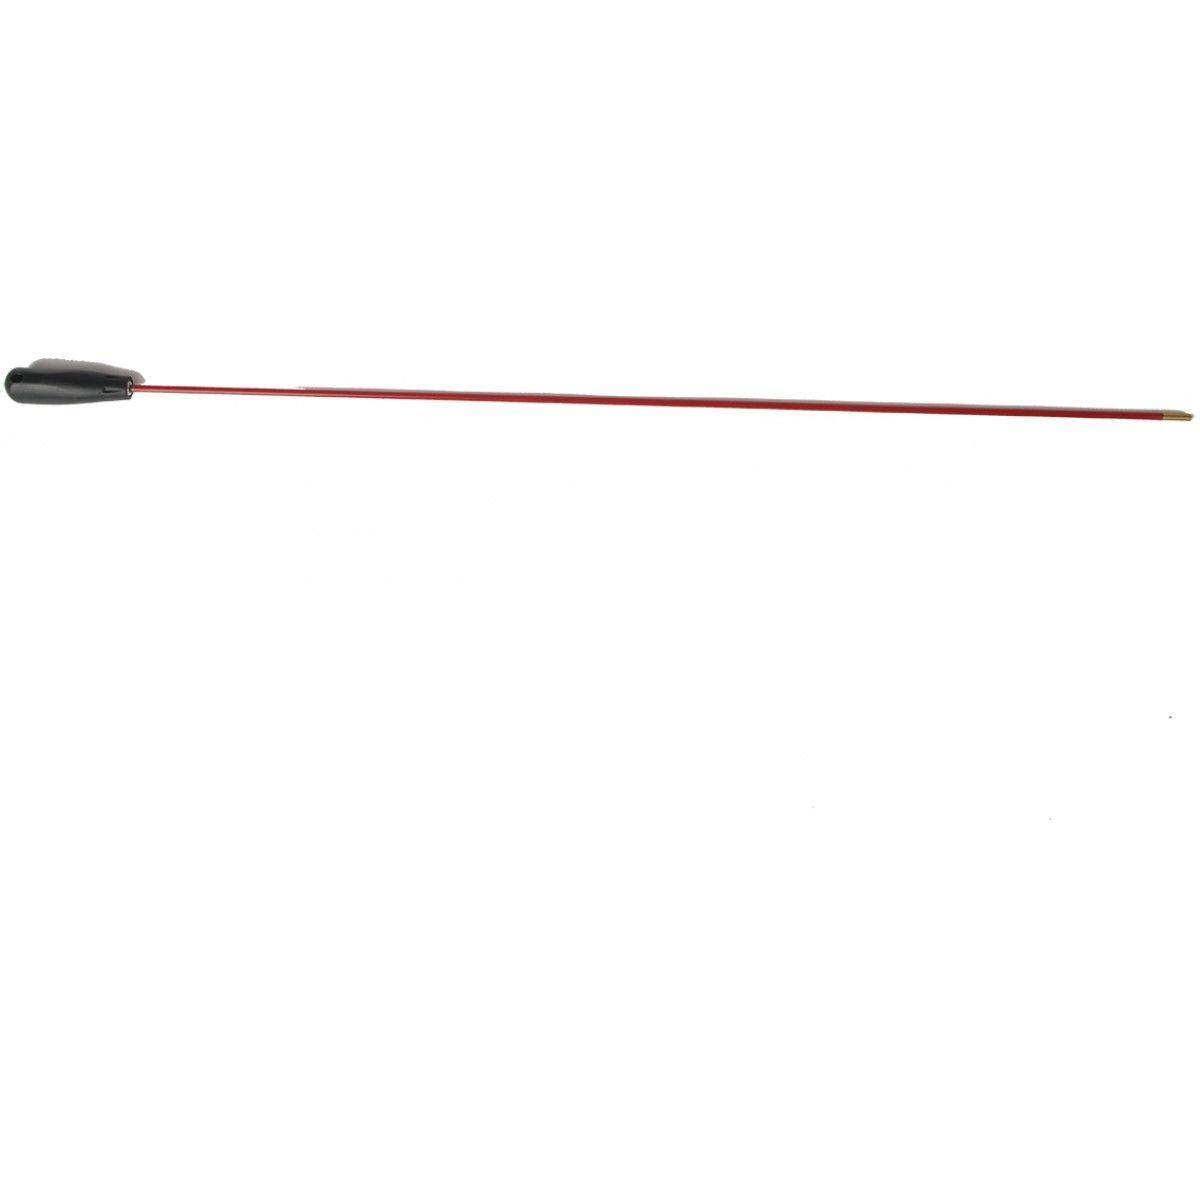 Шомпол Helios 4,6мм, L-710мм HS6552-4,6mm